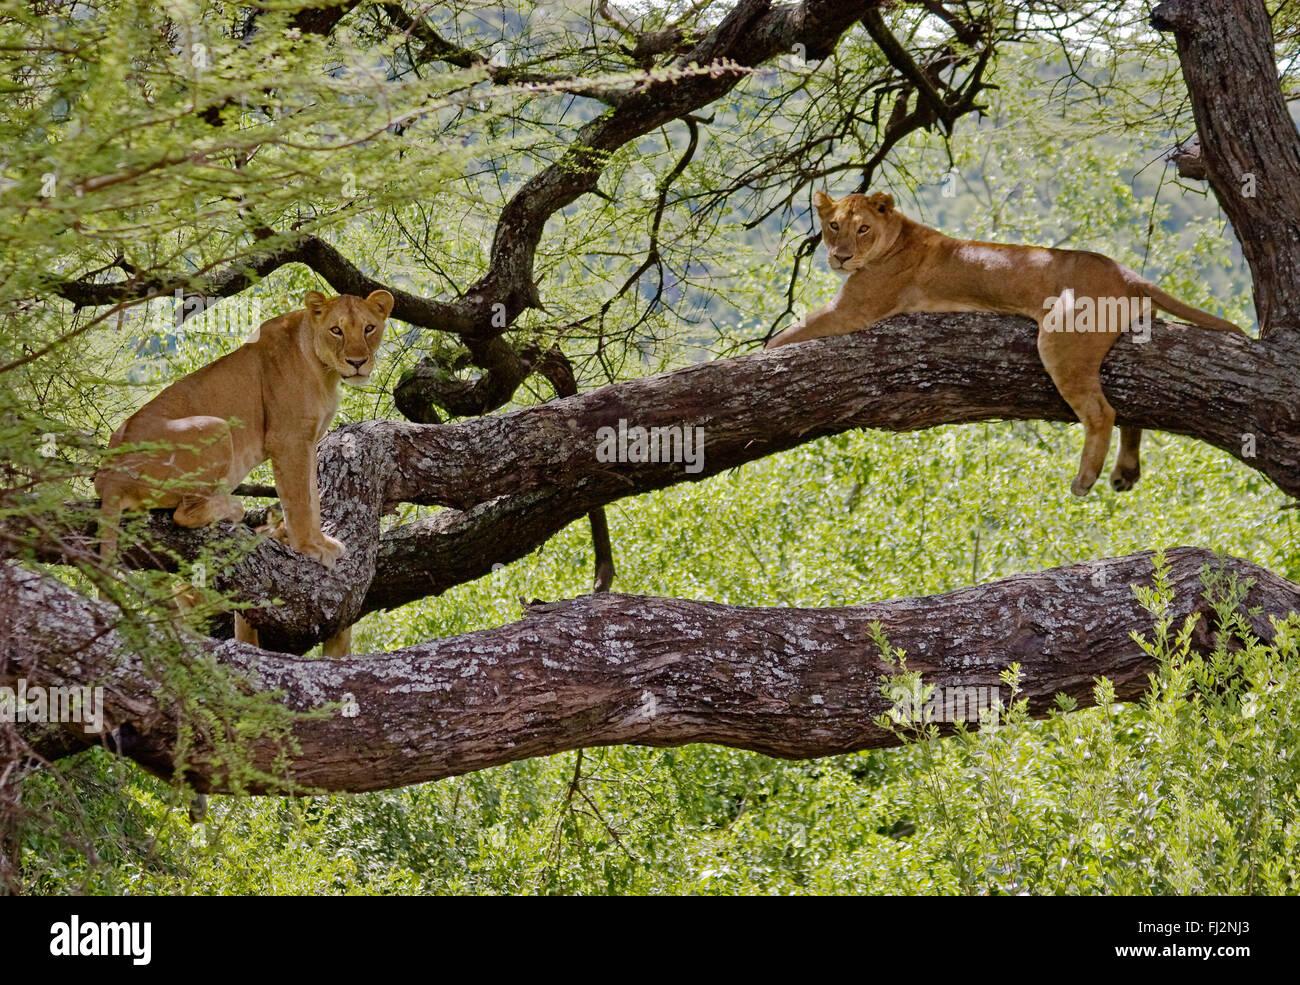 Female LIONS (Panthera leo) in a tree - LAKE MANYARA NATIONAL PARK, TANZANIA - Stock Image